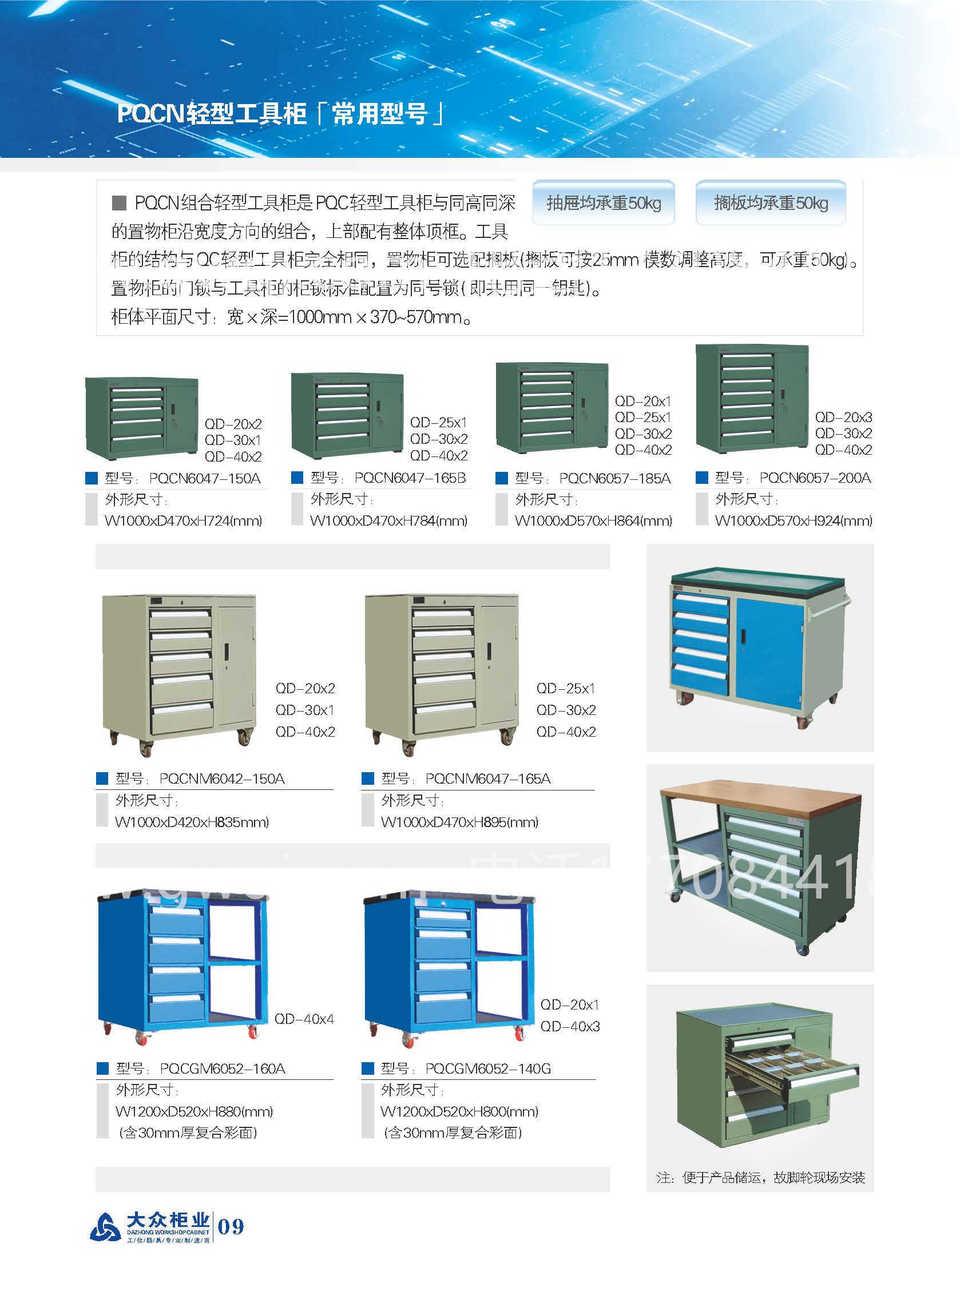 QCN系列(左边PQC柜子,右边置物柜,每层承重50KG,抽屉100%打开)